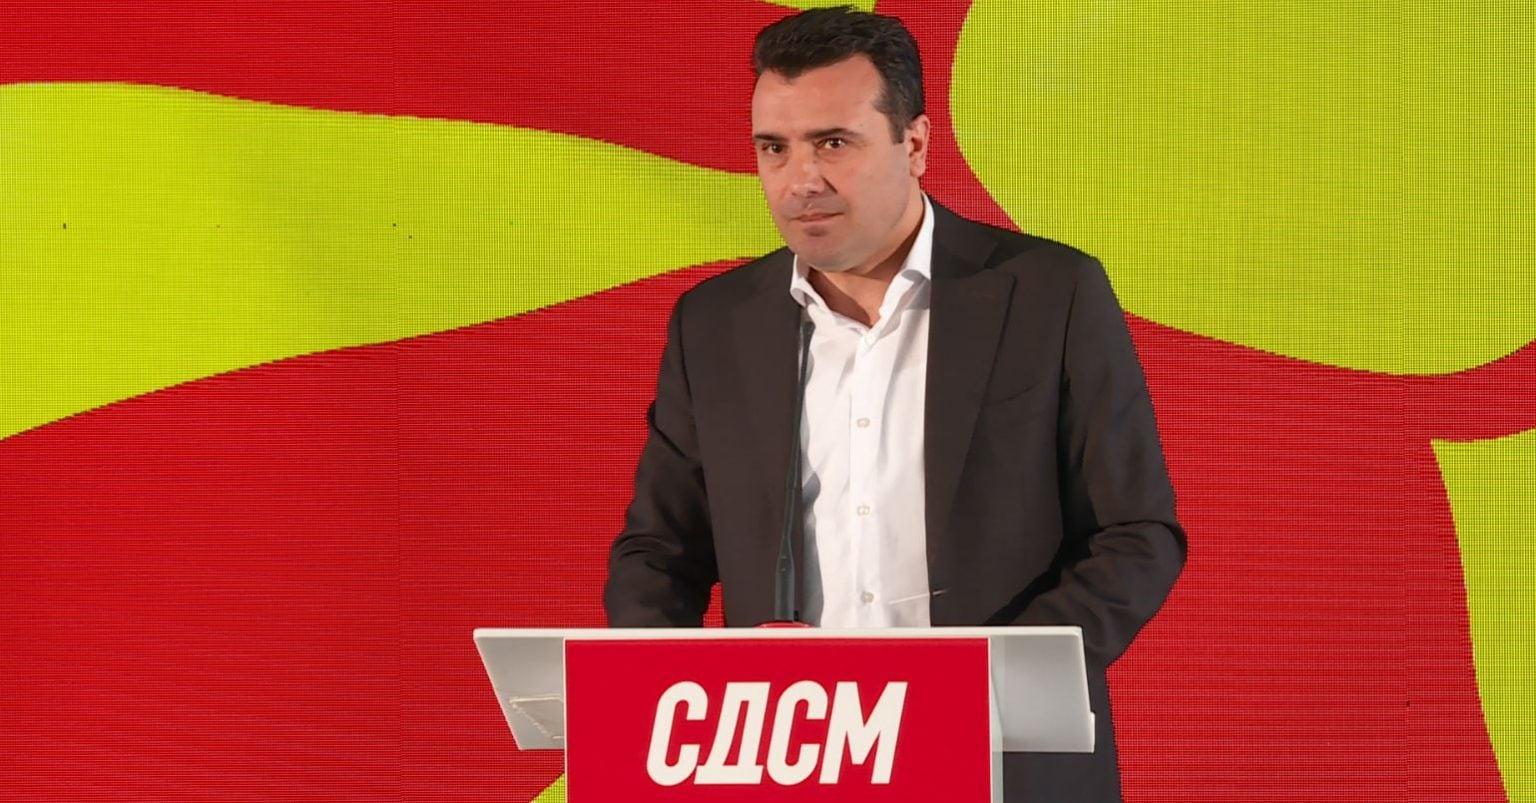 zaev-nacionalizmi-nuk-ka-ardhmeri-ne-maqedonine-e-veriut